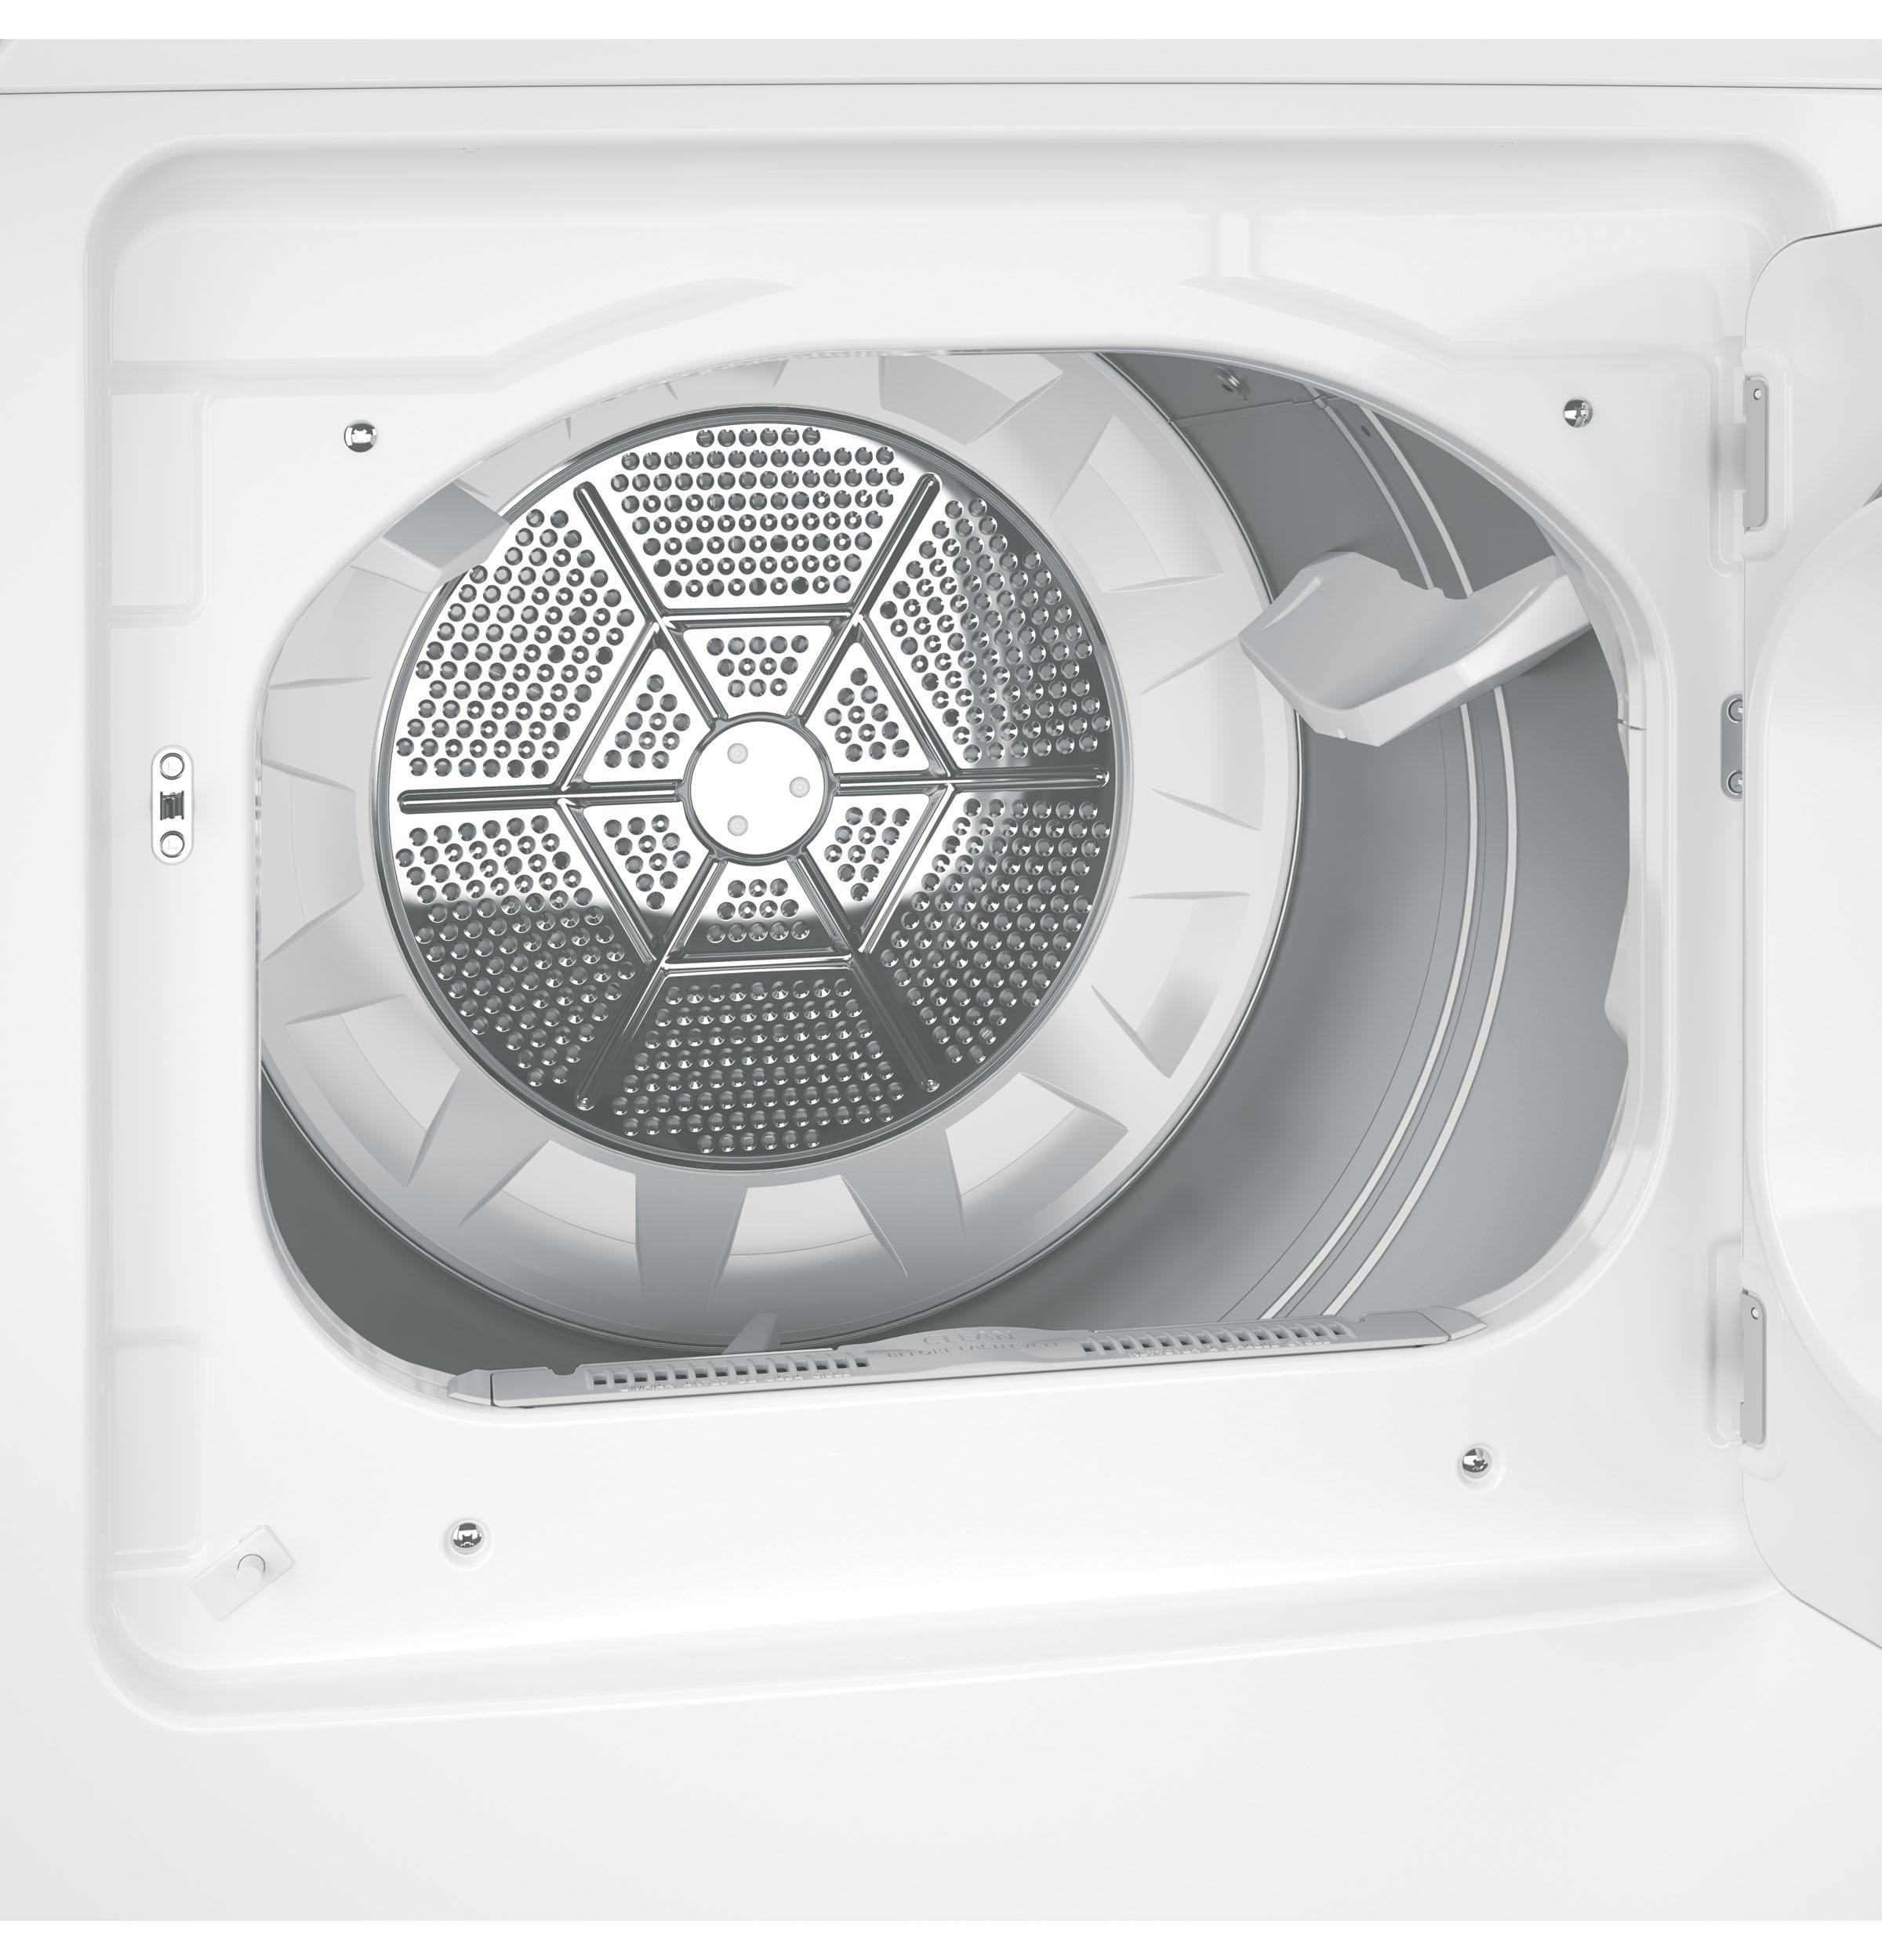 GE Appliances GTD42GASJWW 7.2 cu. ft. Gas Dryer w/ Aluminized Alloy Drum - White